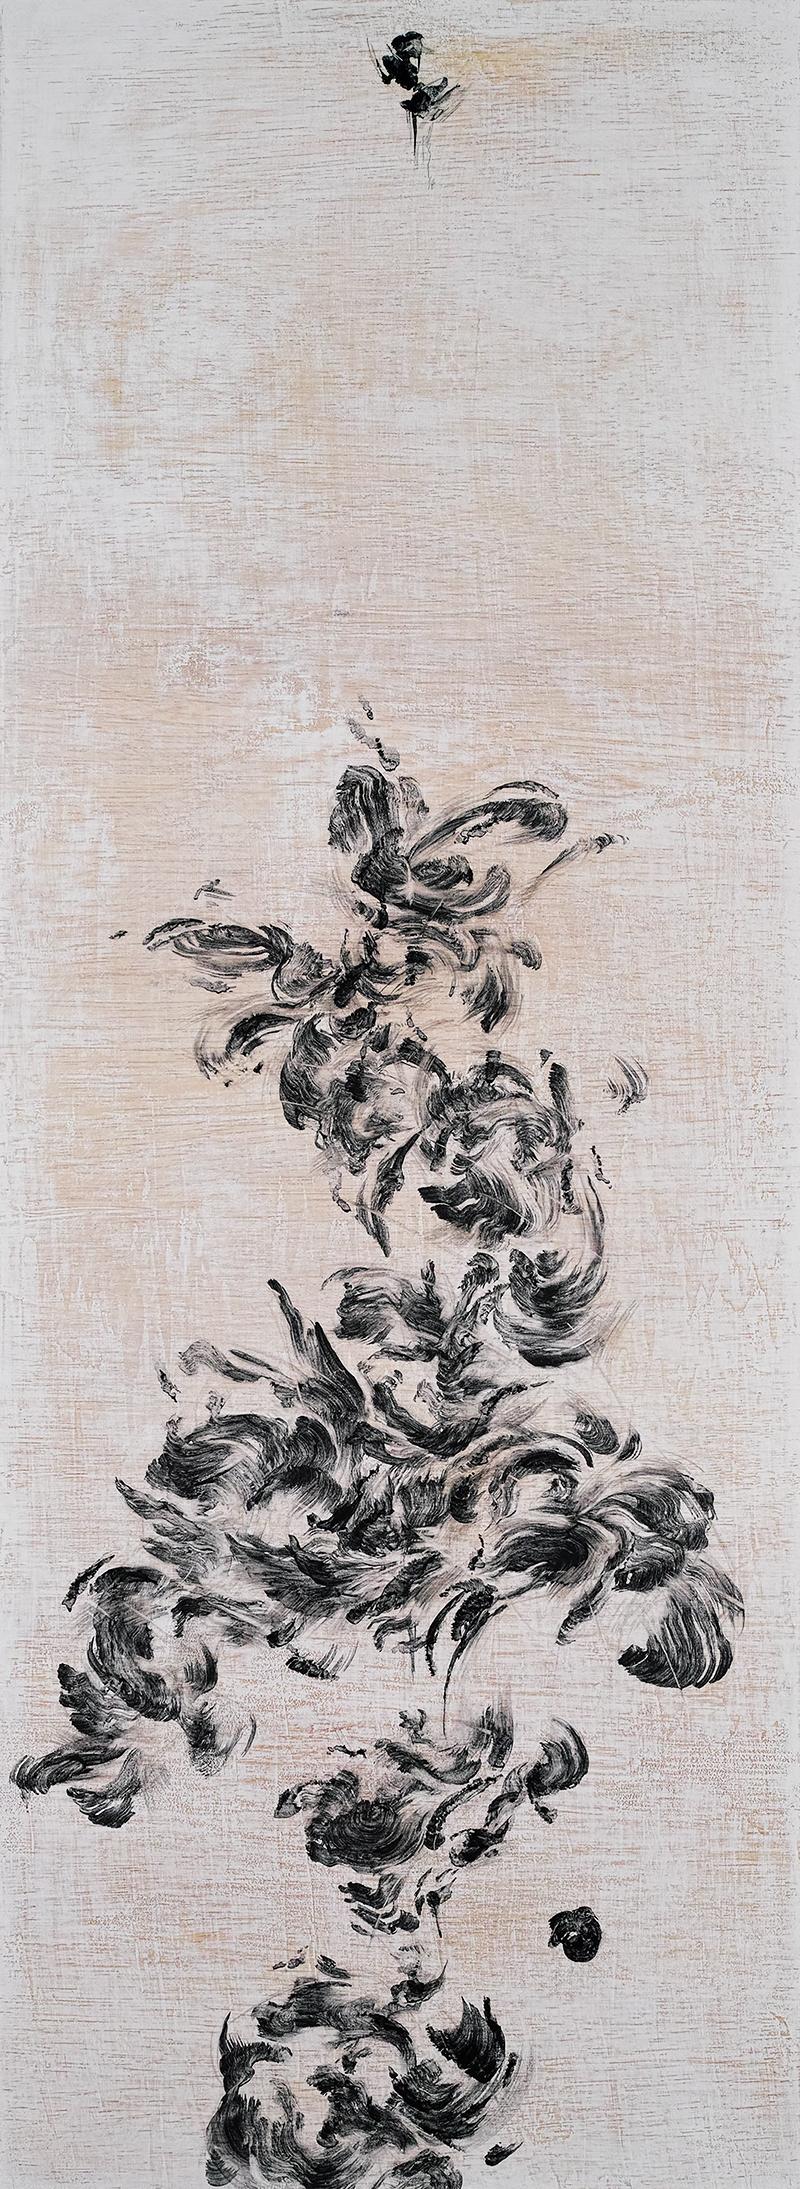 "Flower Flights II    Charcoal on wood 2018 110cm x 40cm  Exhibited at Art Porters Gallery ""Flower Flights"" solo exhibition.  past series:  Flower Flights"